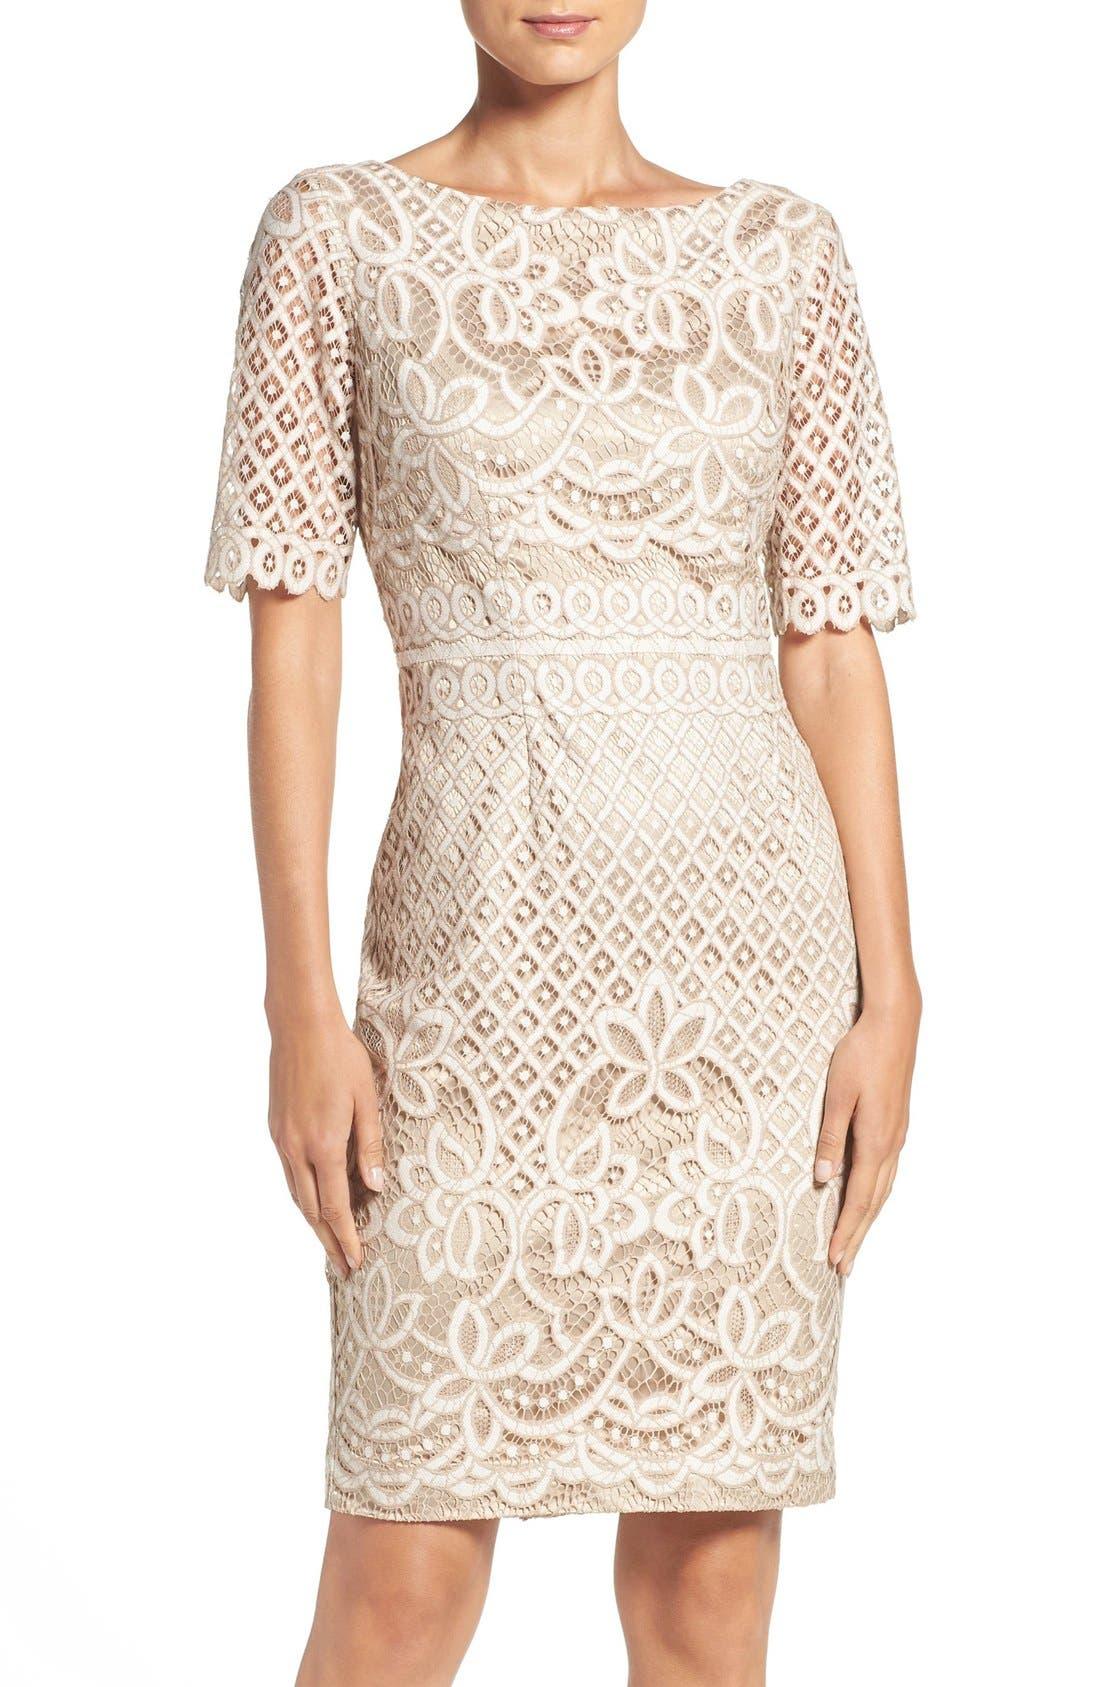 Lace Sheath Dress,                             Main thumbnail 1, color,                             IVORY NUDE